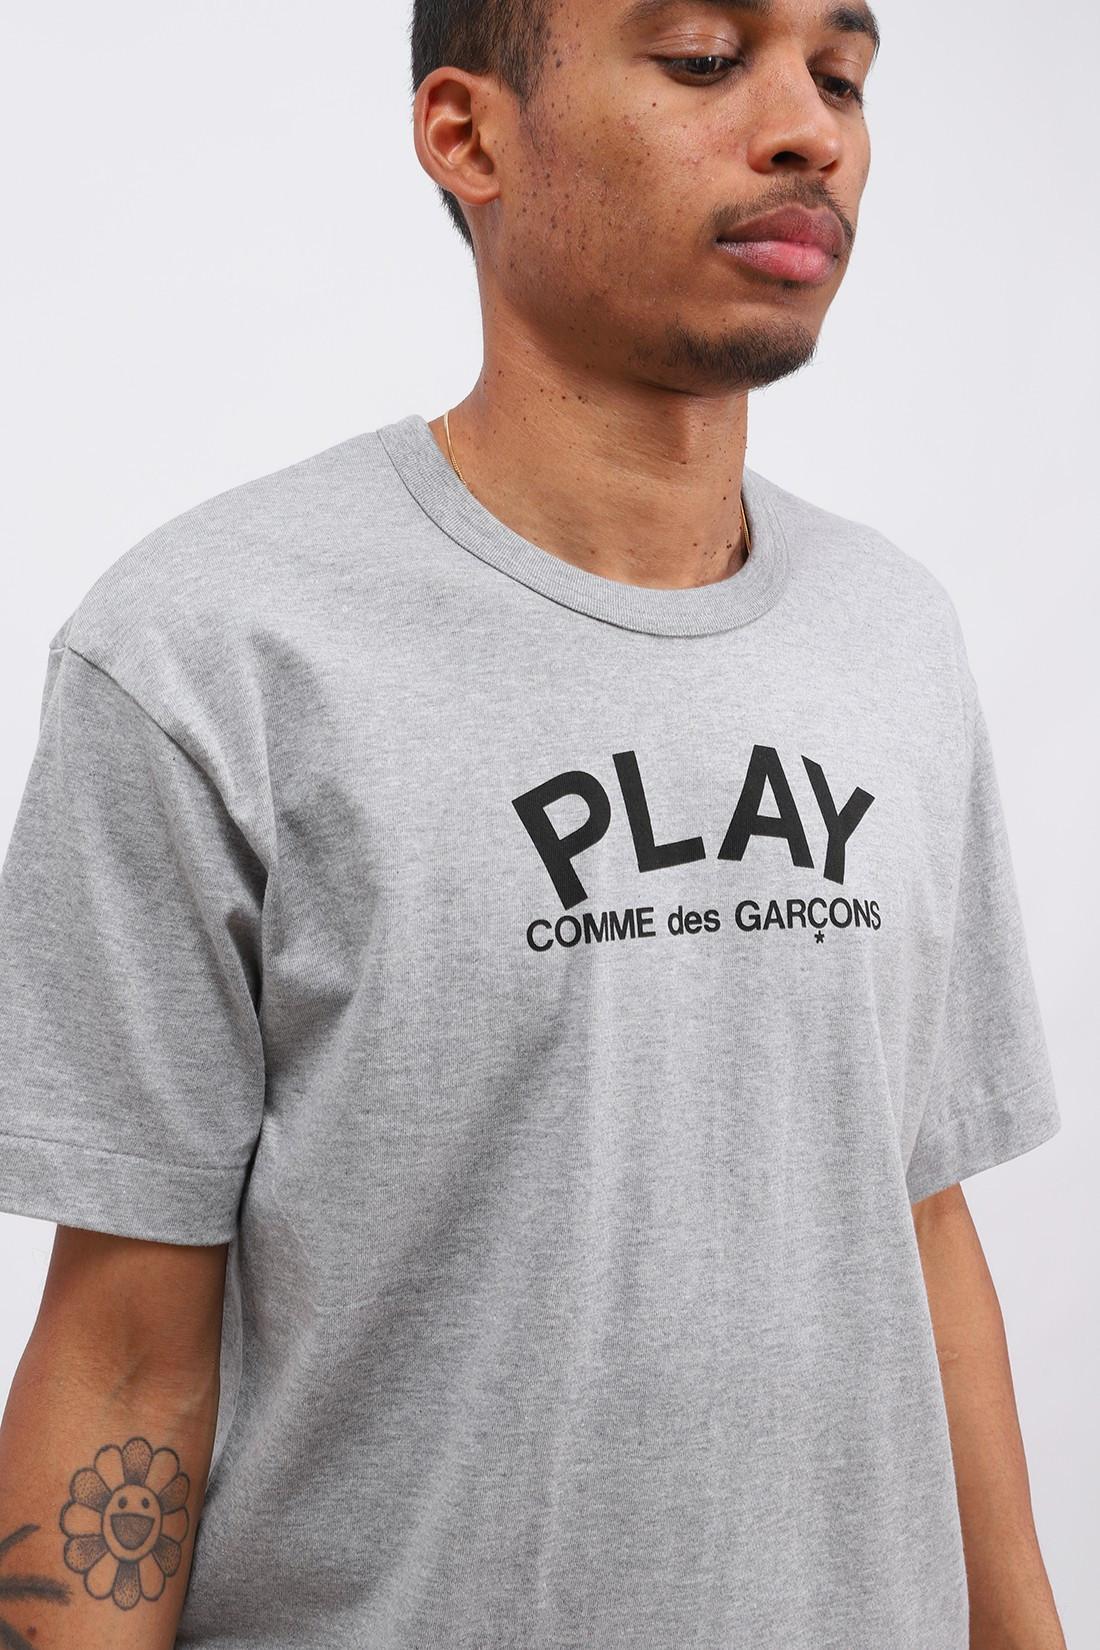 COMME DES GARÇONS PLAY / Play logo t-shirt Grey